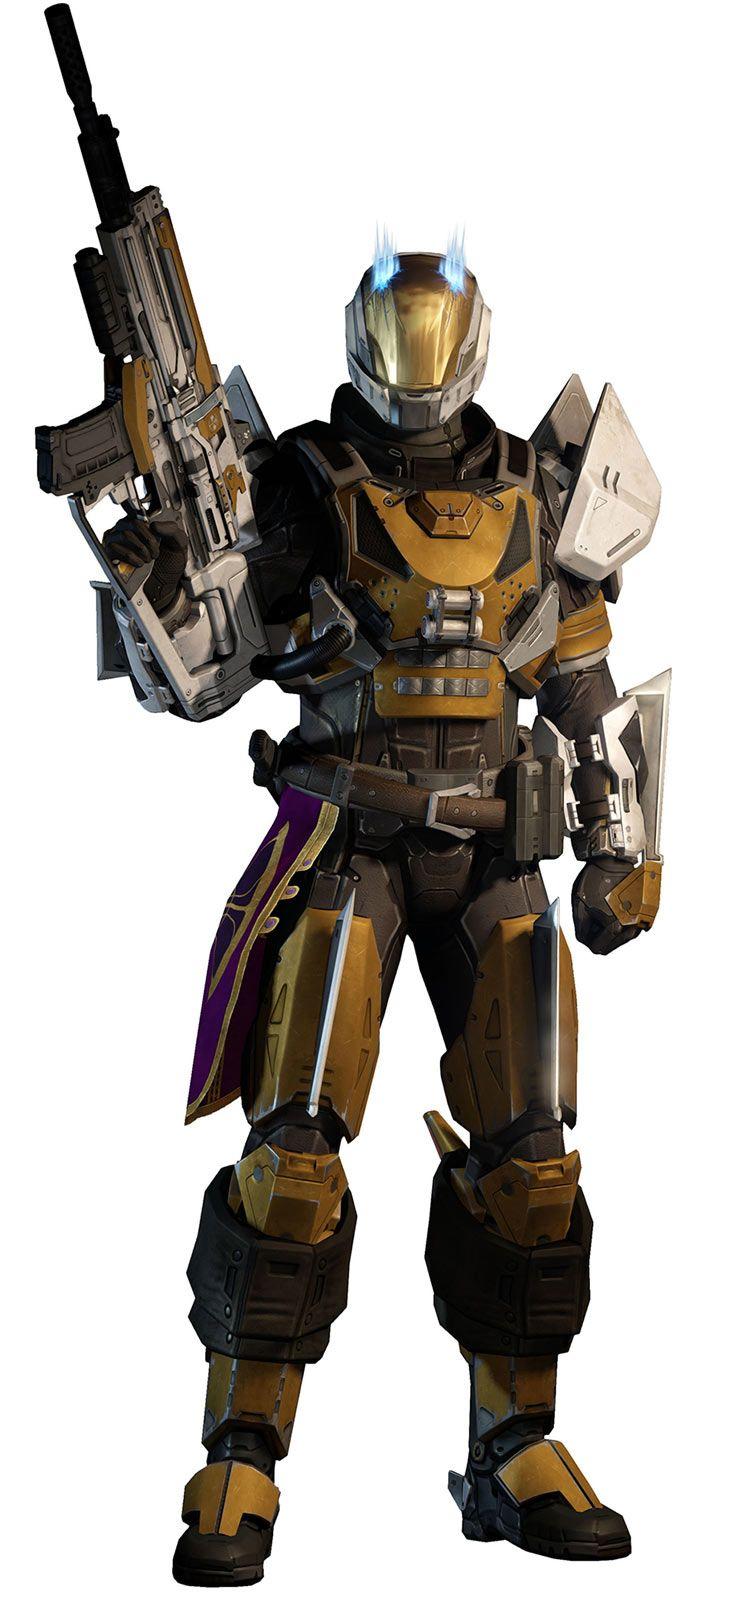 Destiny----Titan, Level 20 | Video Games | Pinterest ...